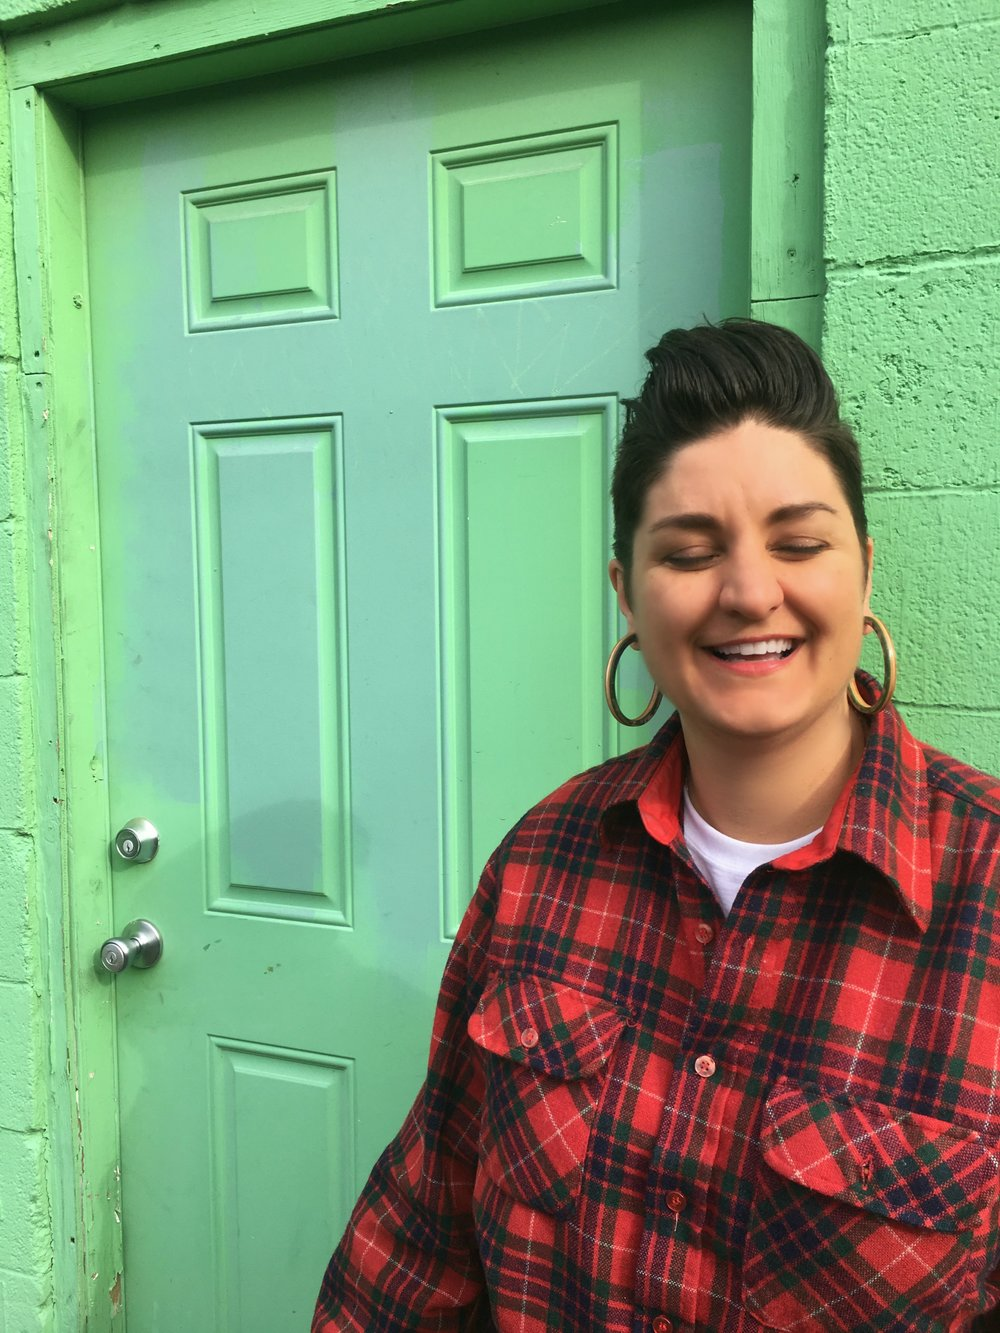 Gina Senarighi Polyamory Coach | Relationship Expert